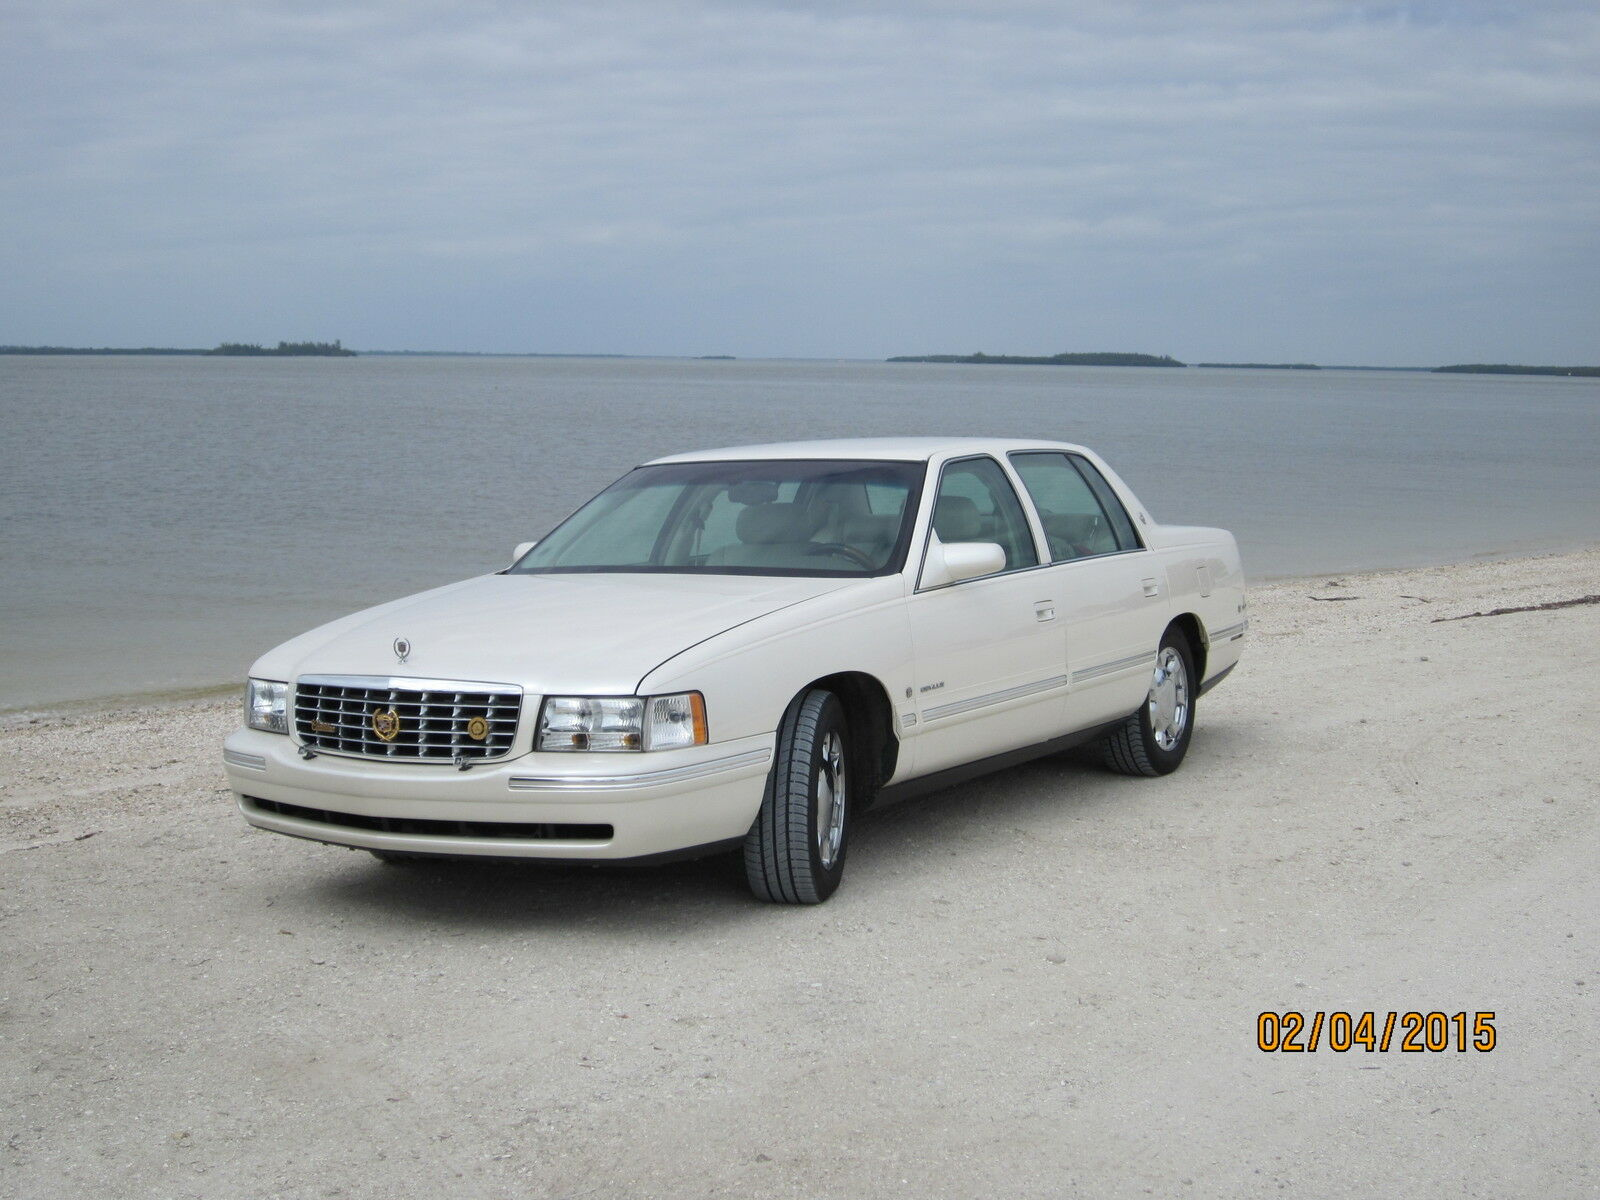 Bills Cadillac Parts